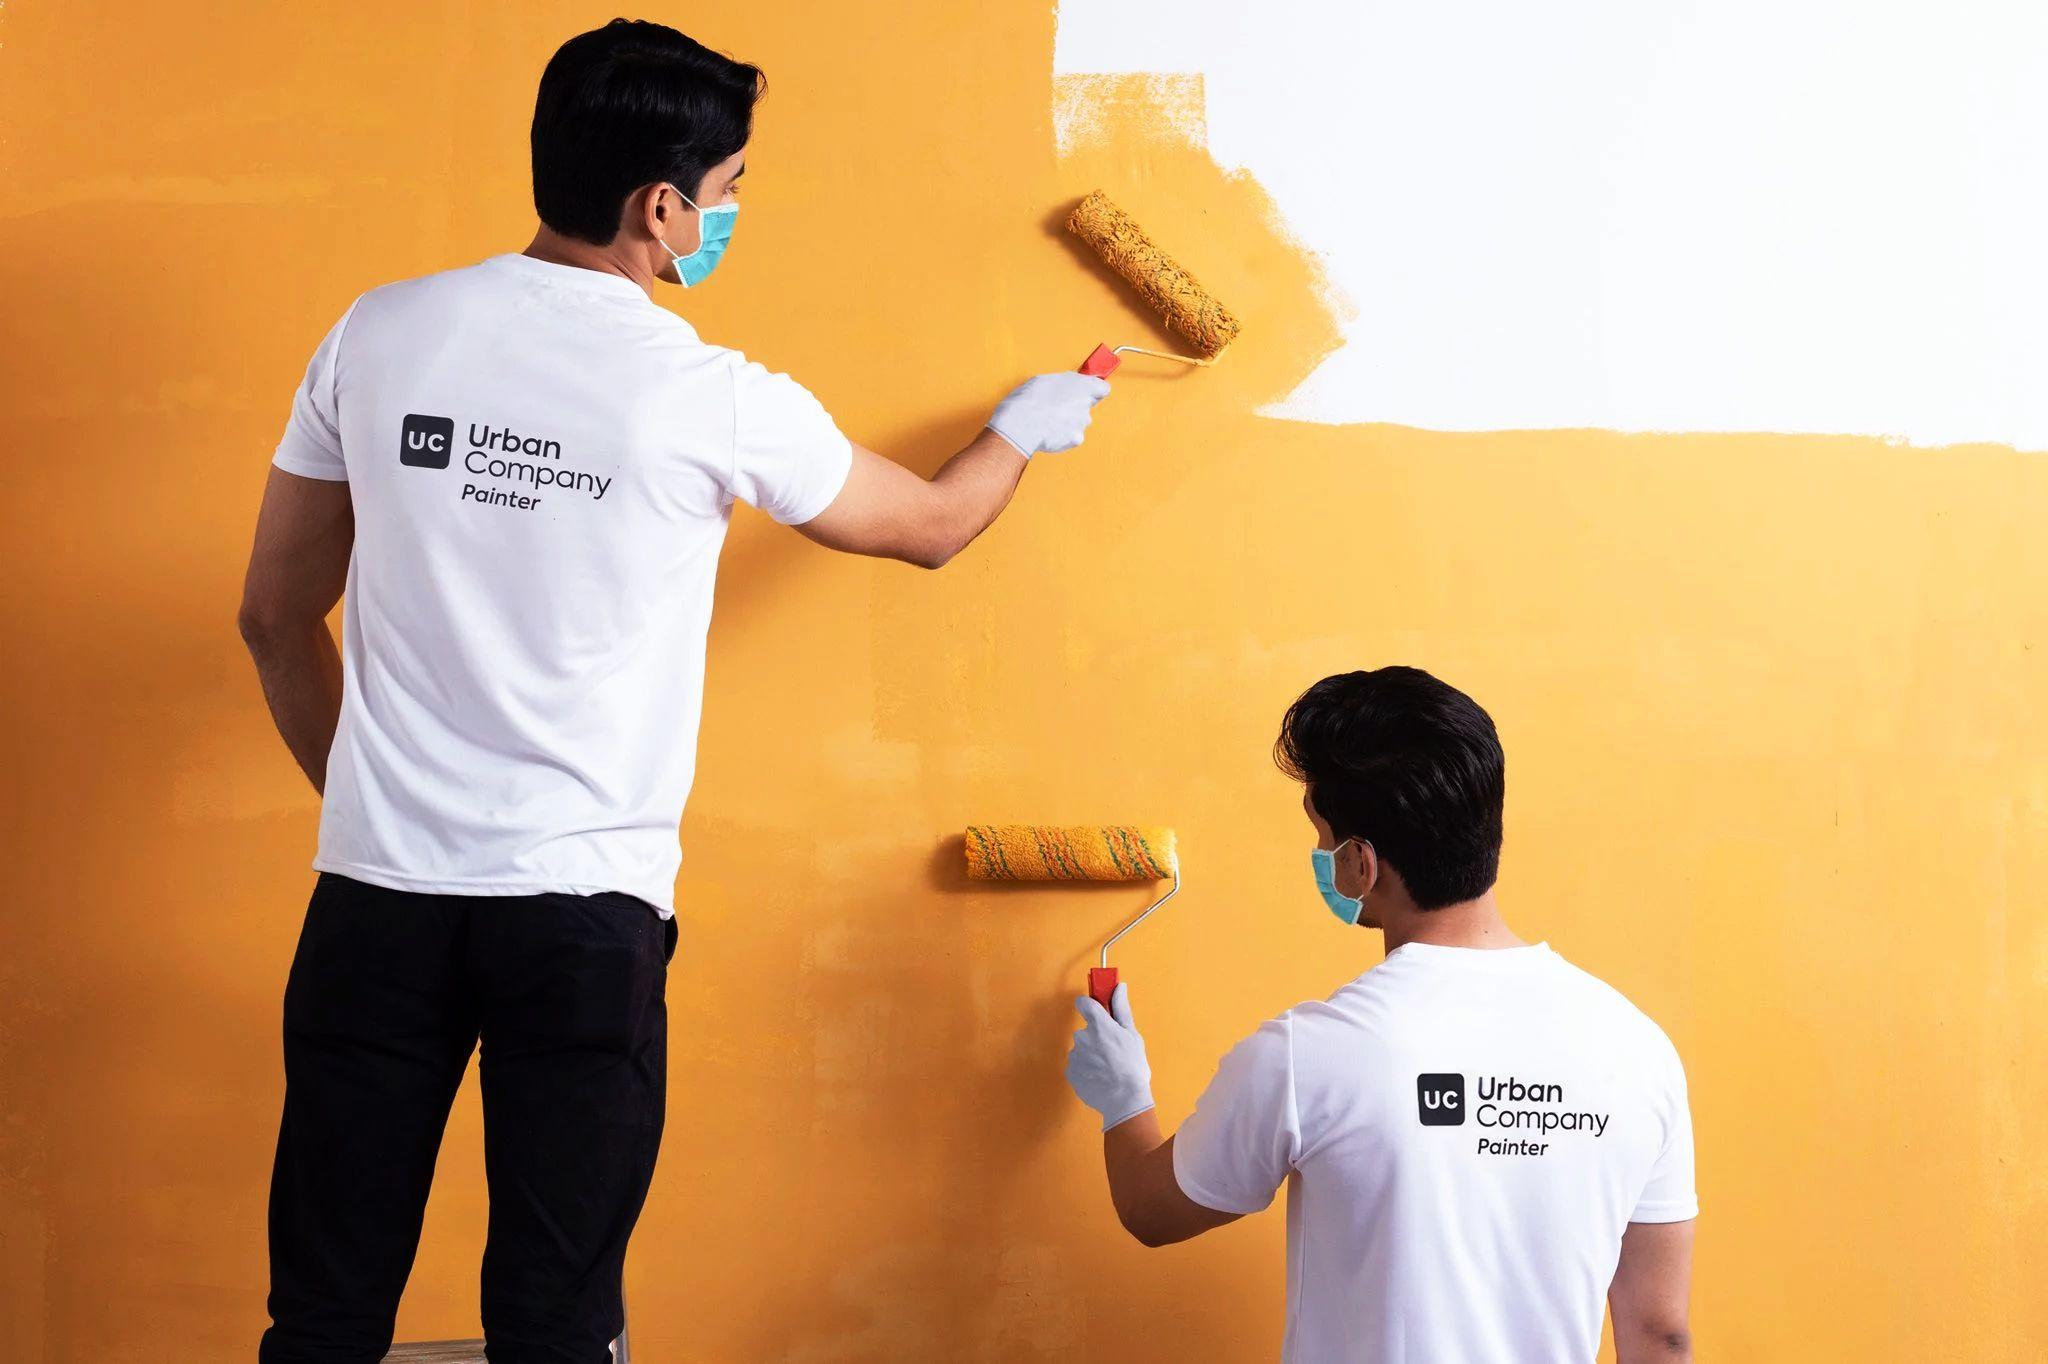 Urban Company service providers painting a wall